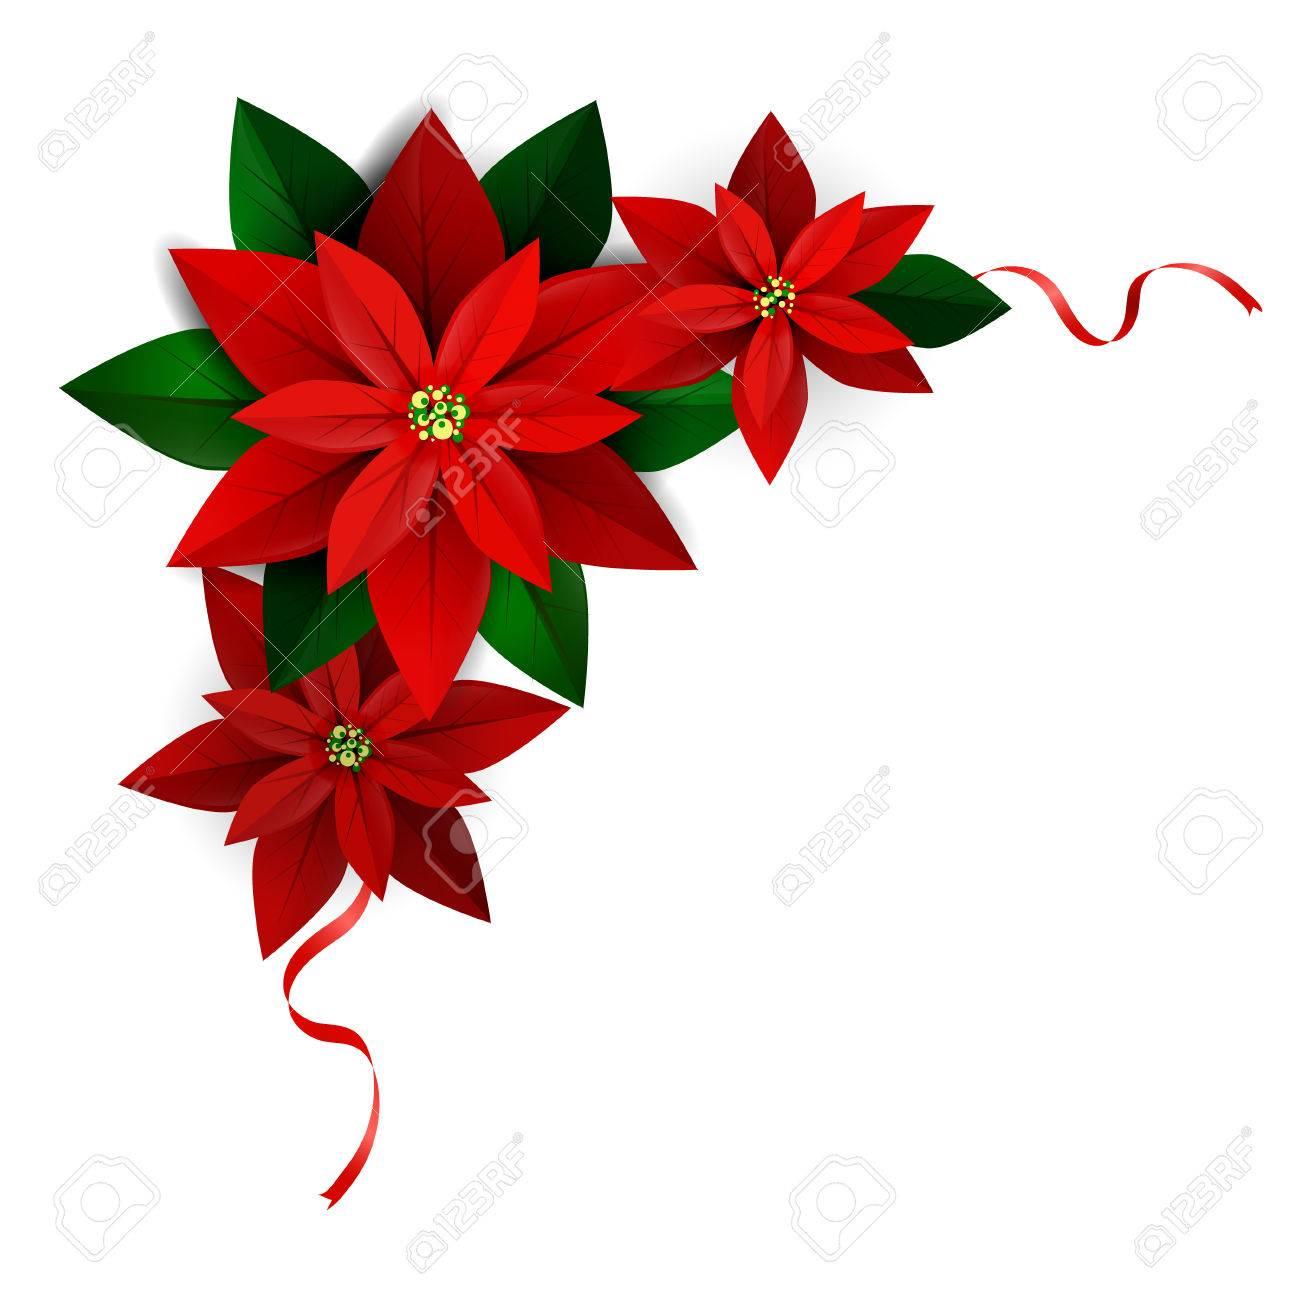 christmas corner decoration on white poinsettia with ribbons rh 123rf com christmas poinsettia clip art free Christmas Tree Clip Art